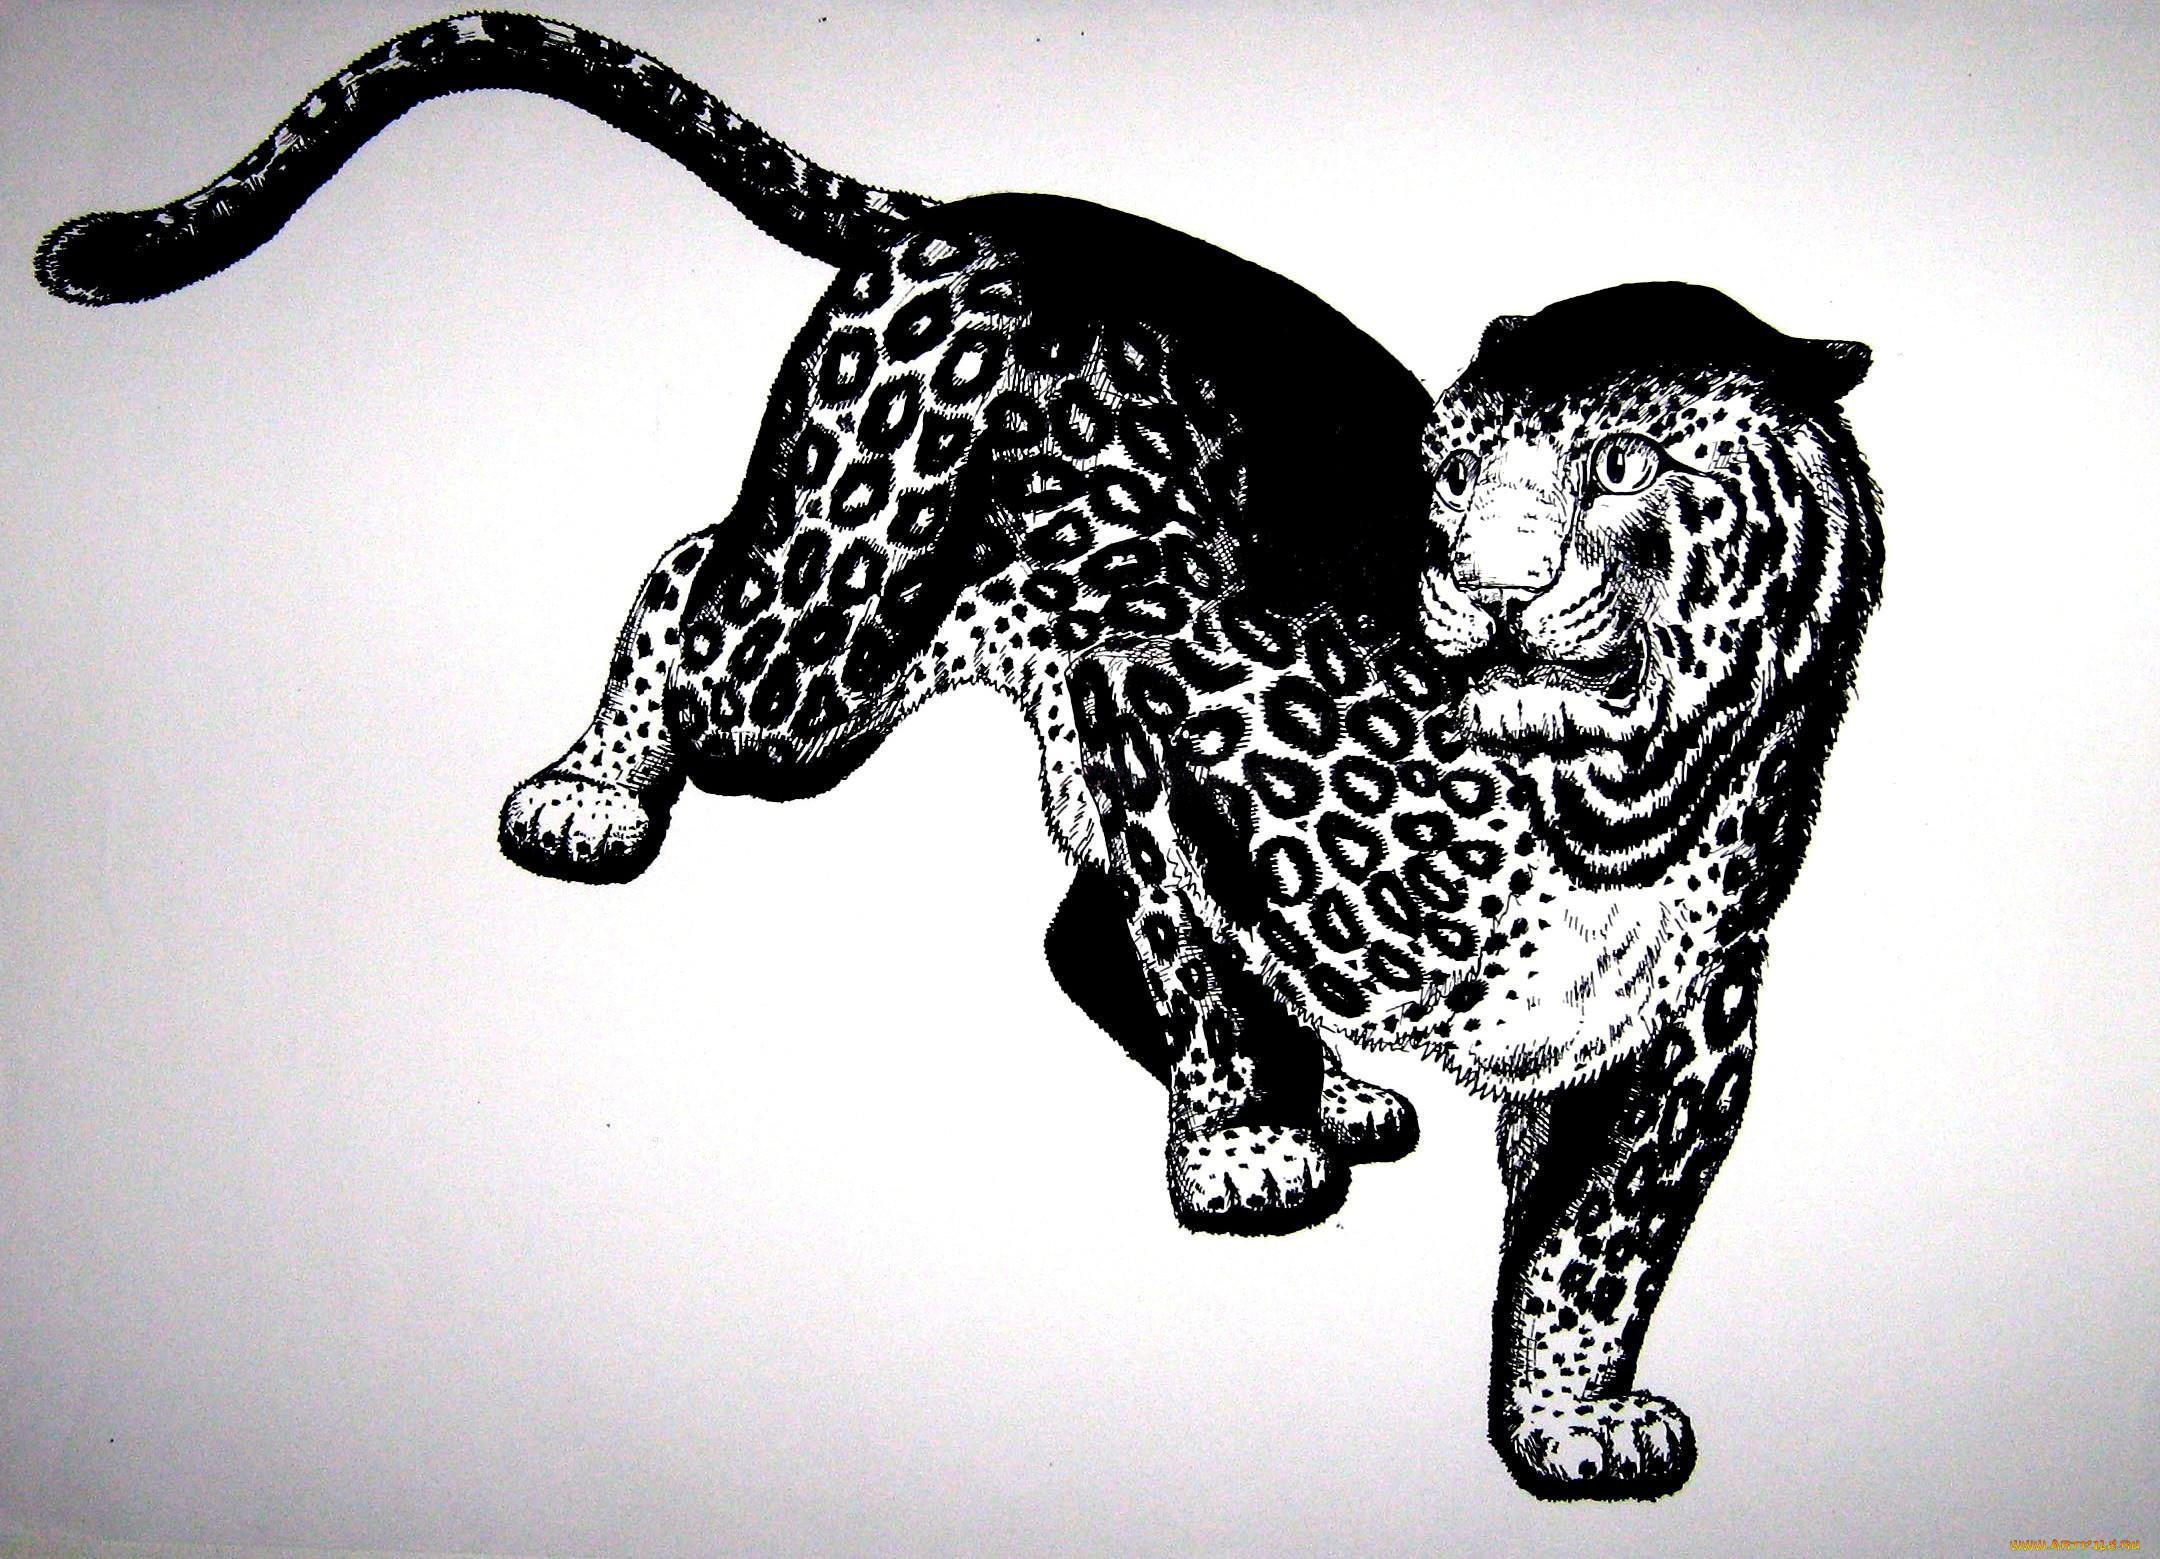 картинки кошки ягуар графика корсаковской црб